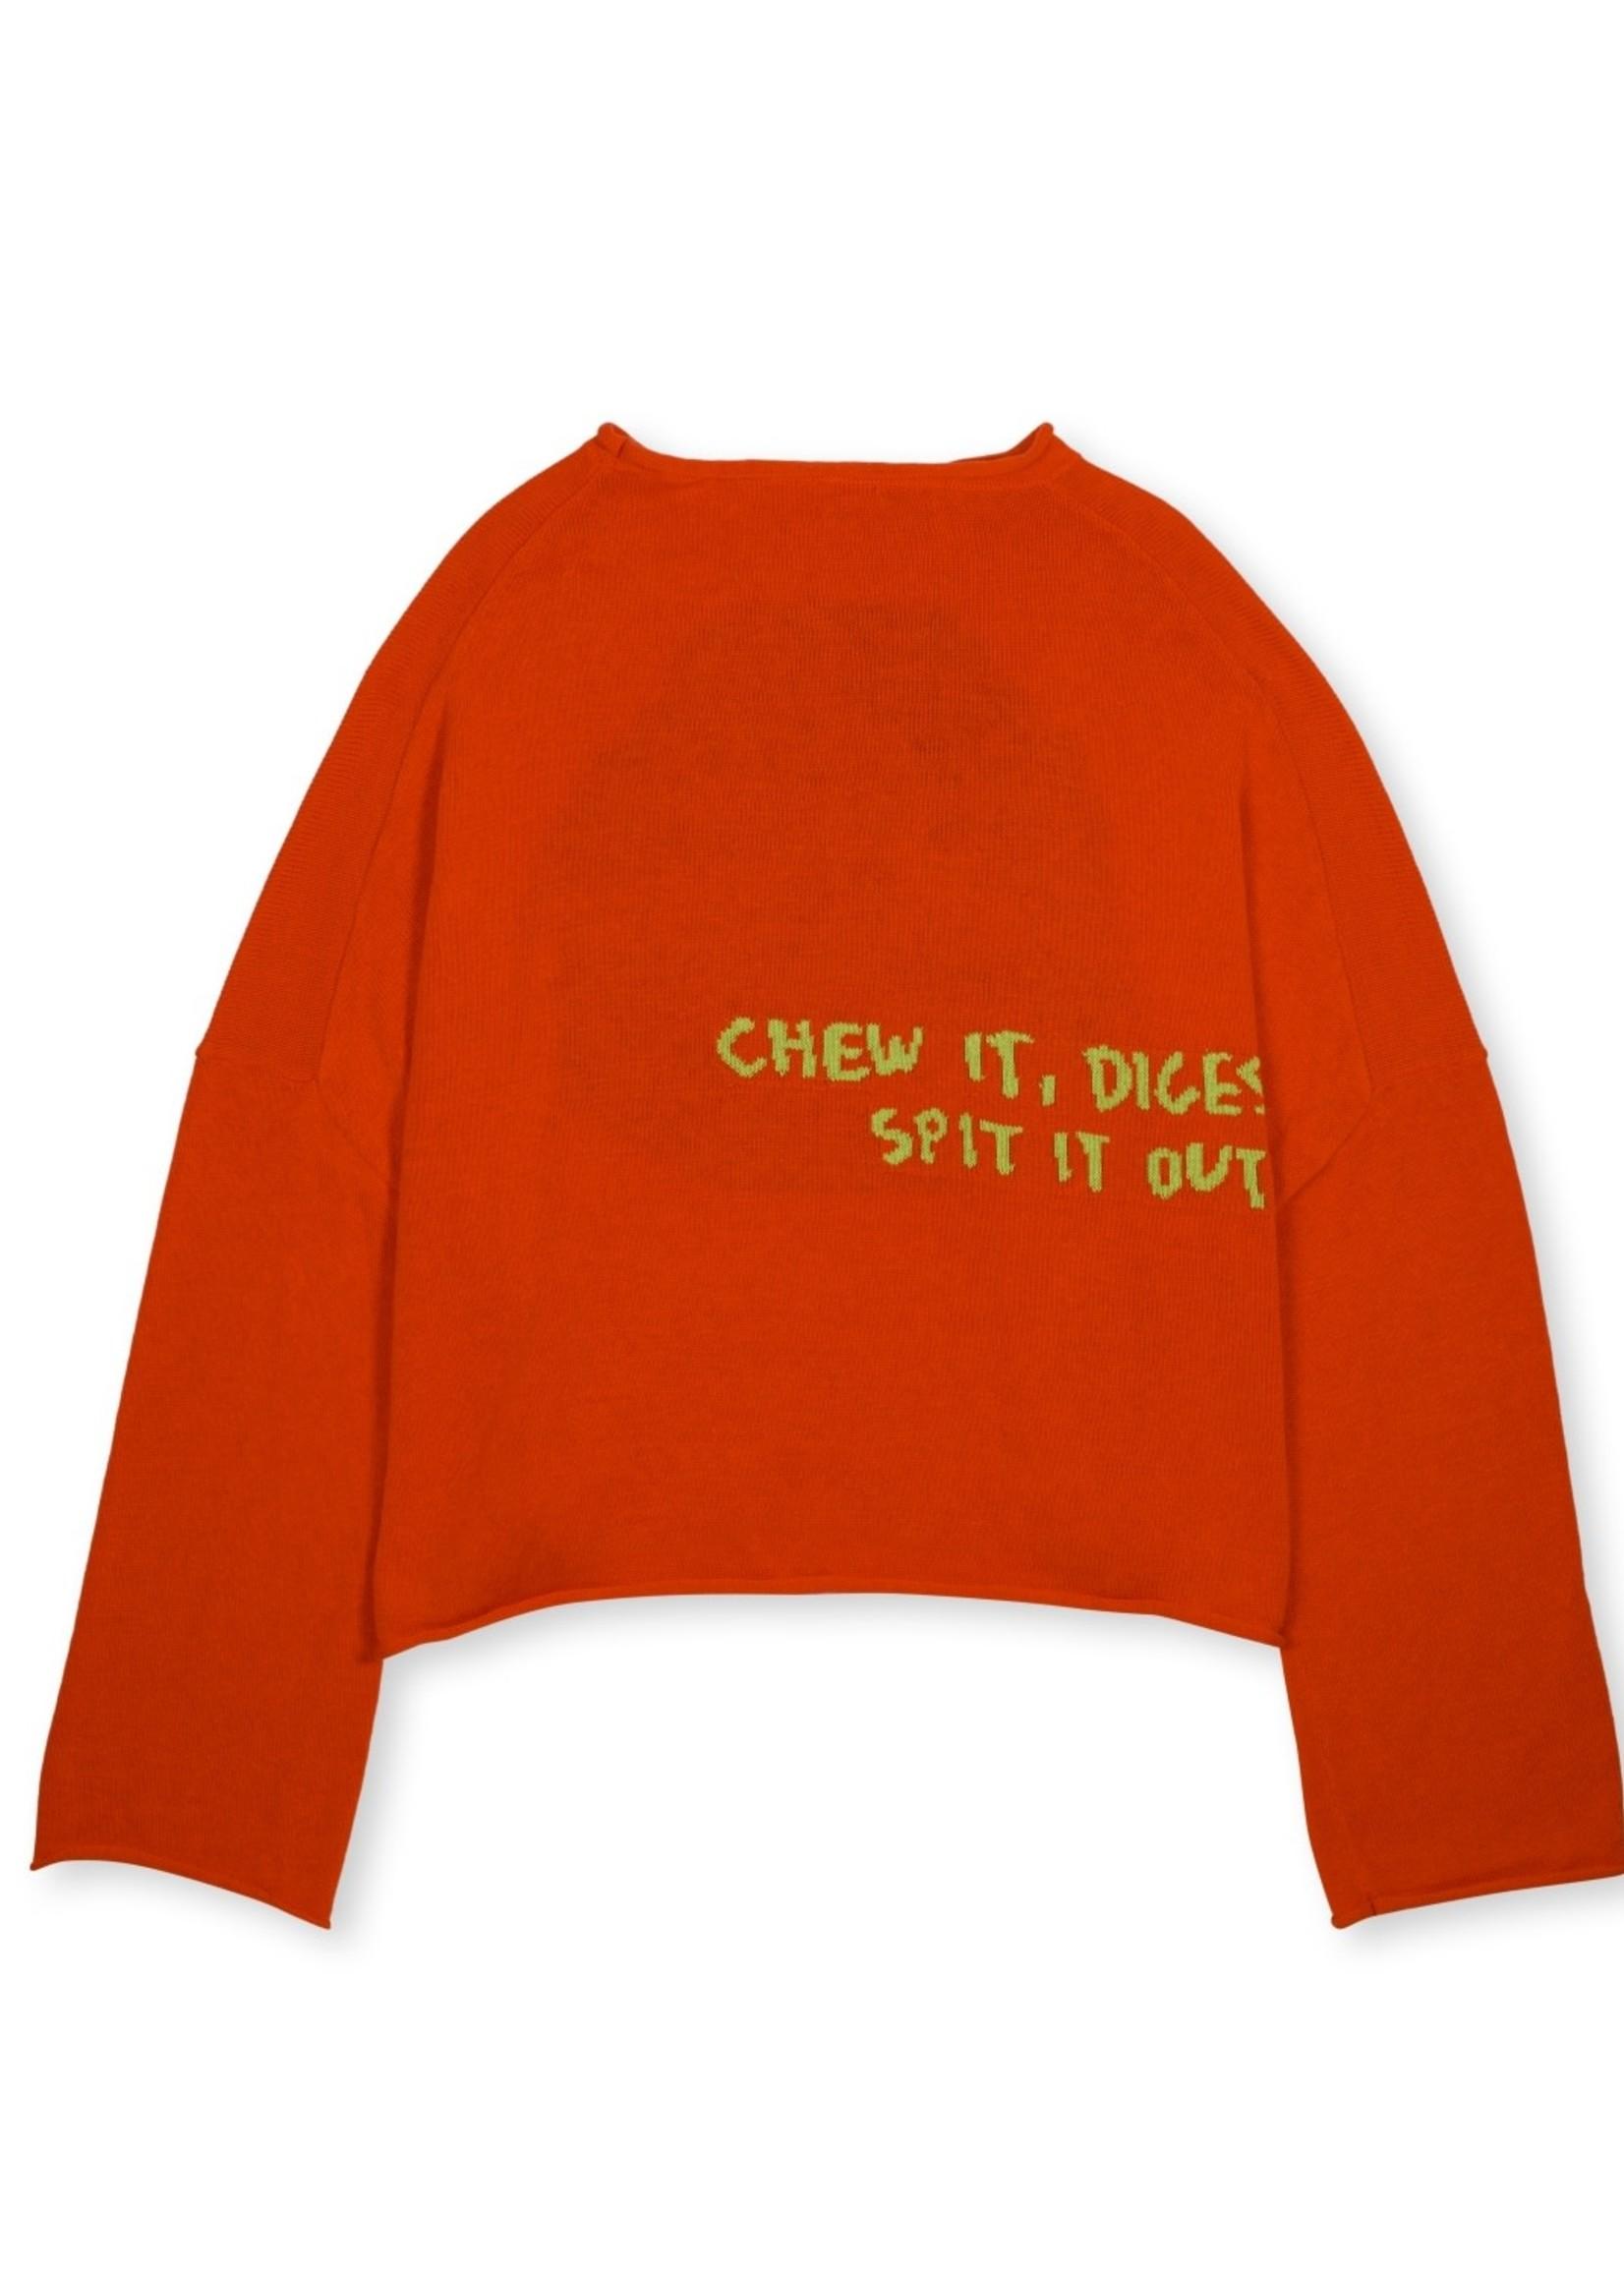 Brain Dead Spit it Cropped Boxy Sweater in Red